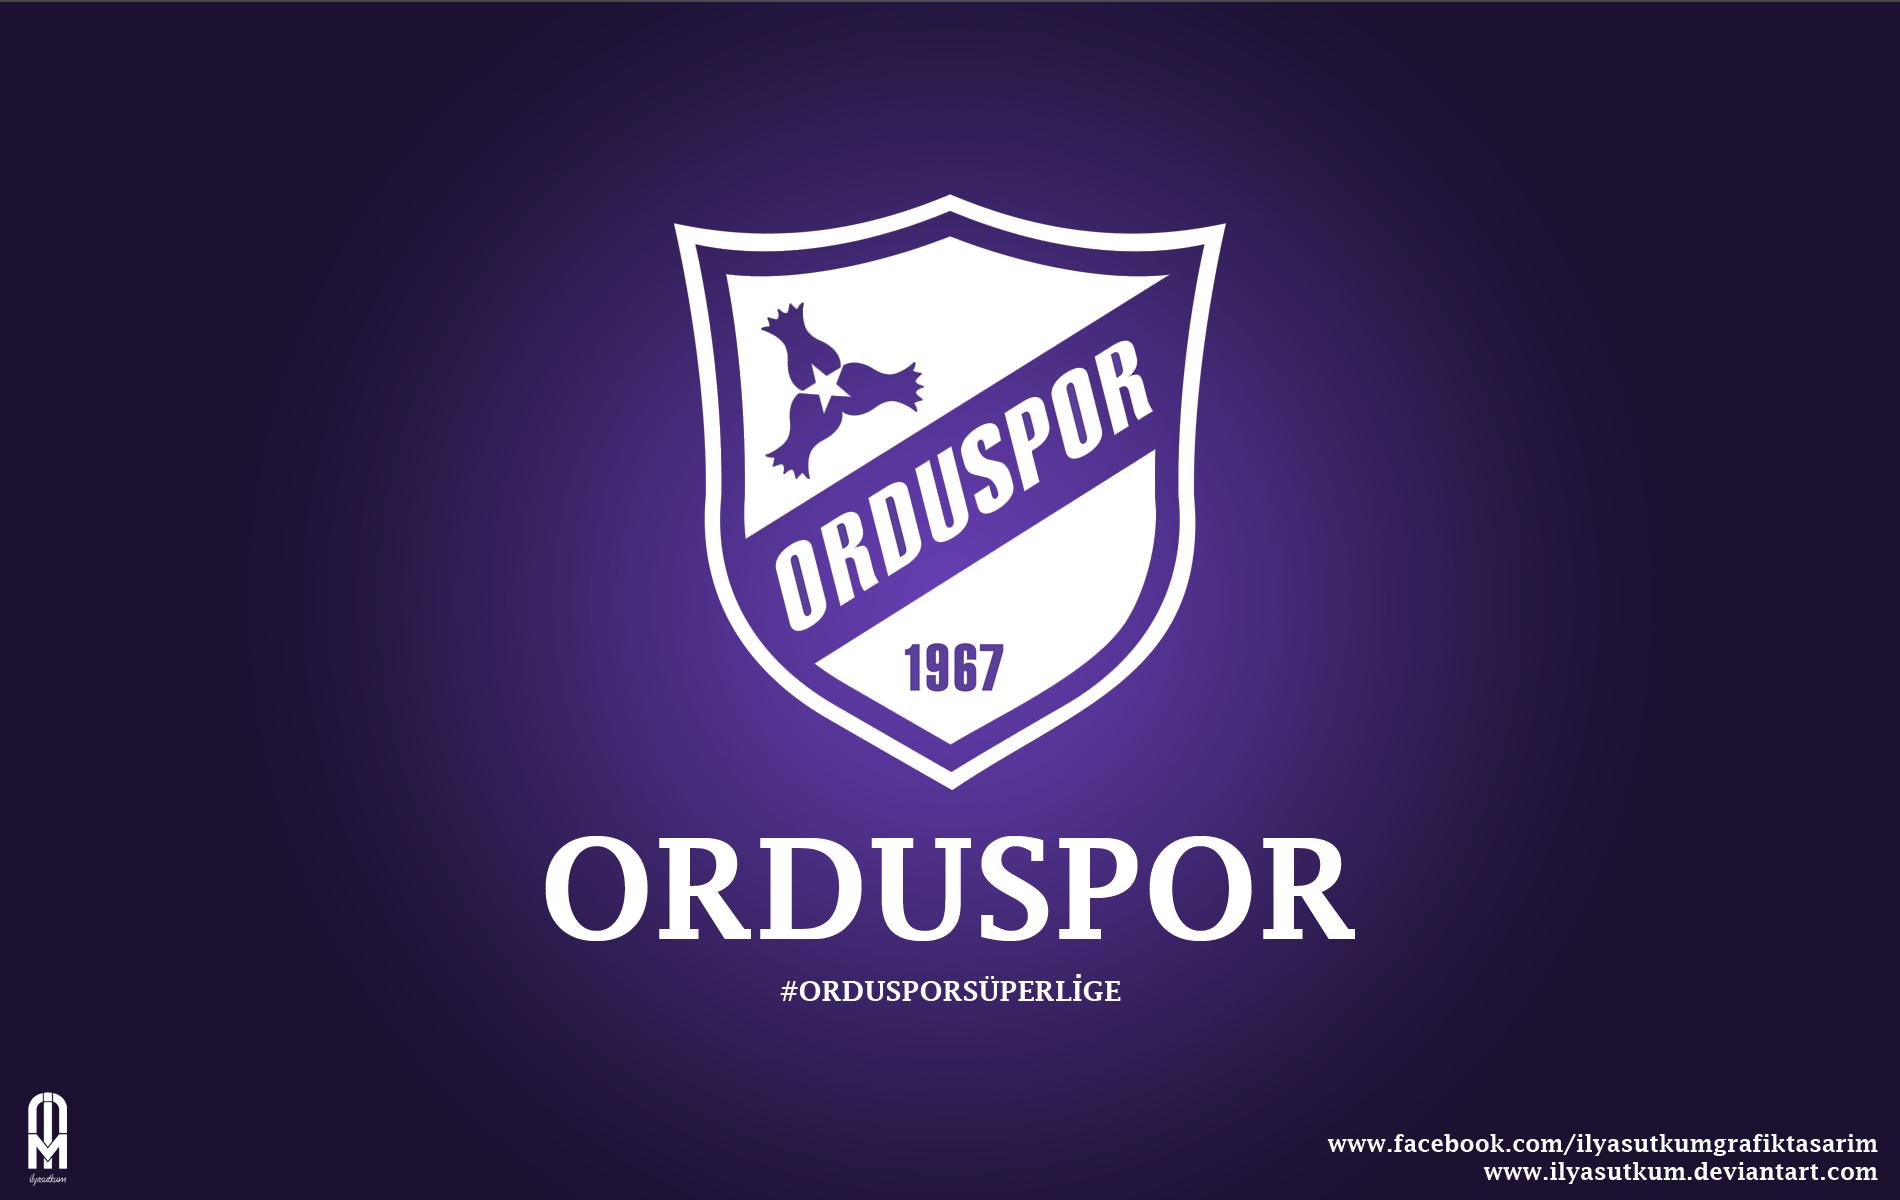 Orduspor Wallpaper HD by ilyasutkum on DeviantArt